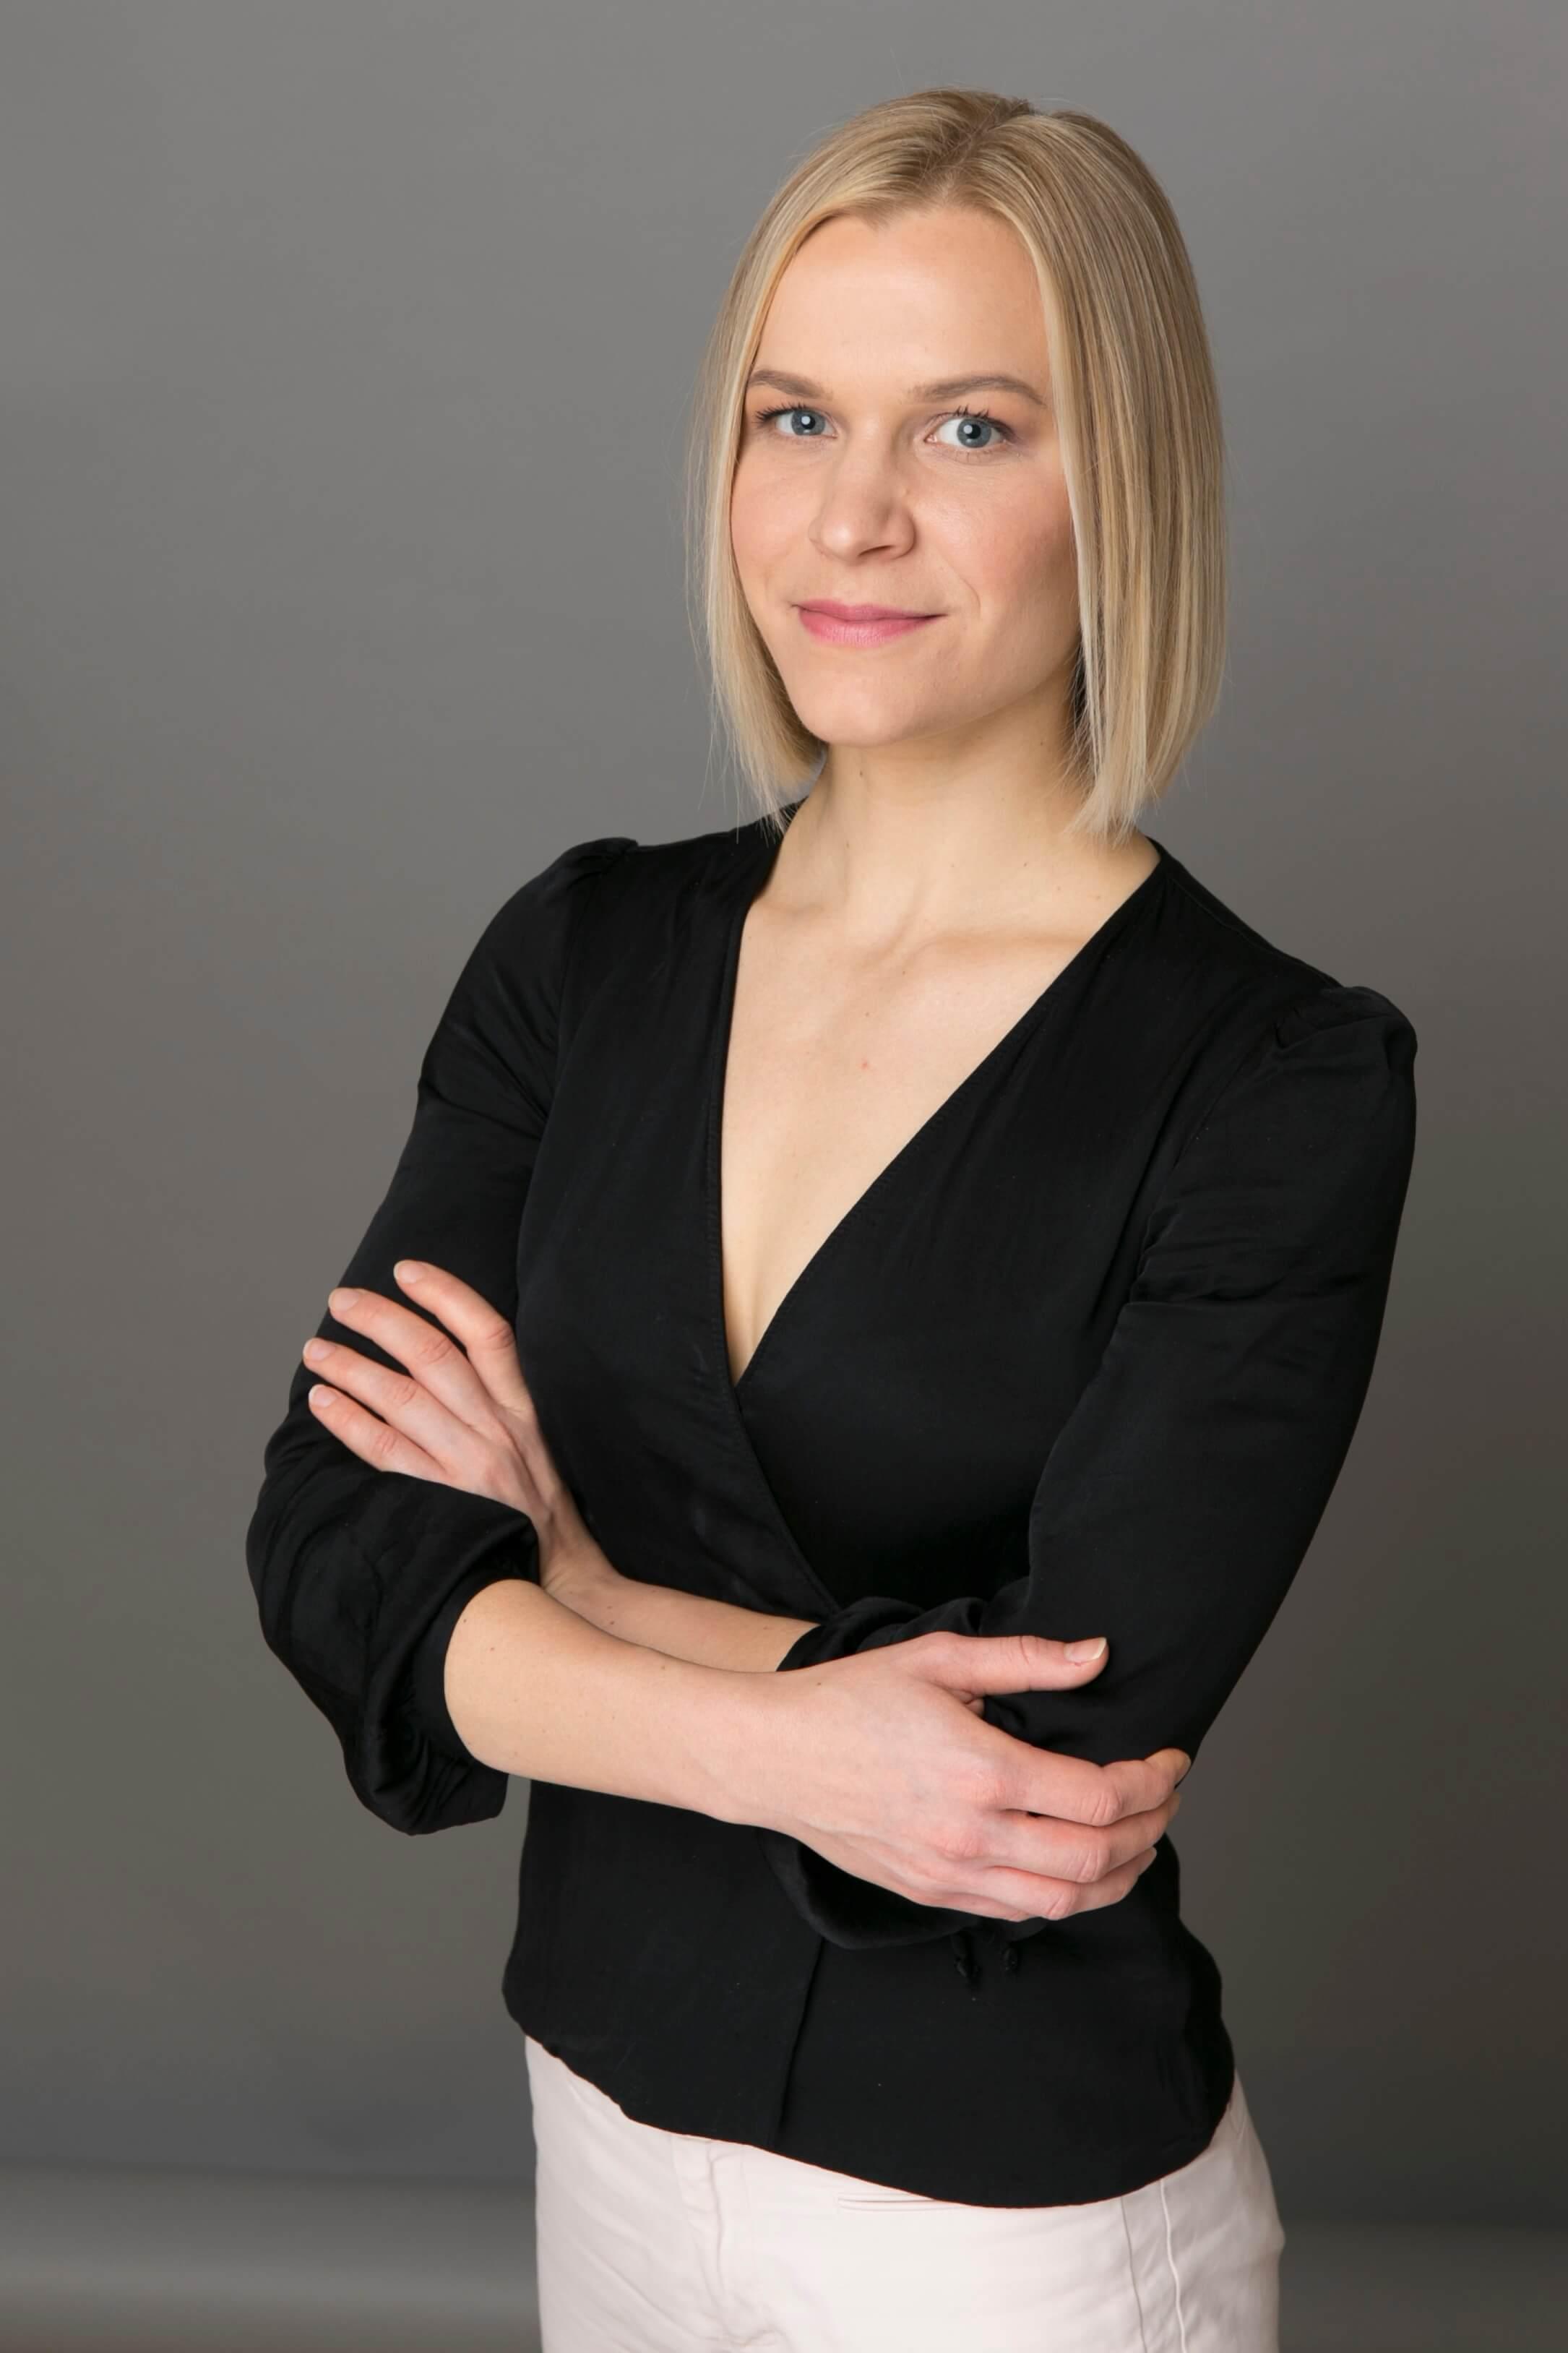 Pásztor Melinda Anna    - alelnök   Digital IT Innovation Manager  The HEINEKEN Company